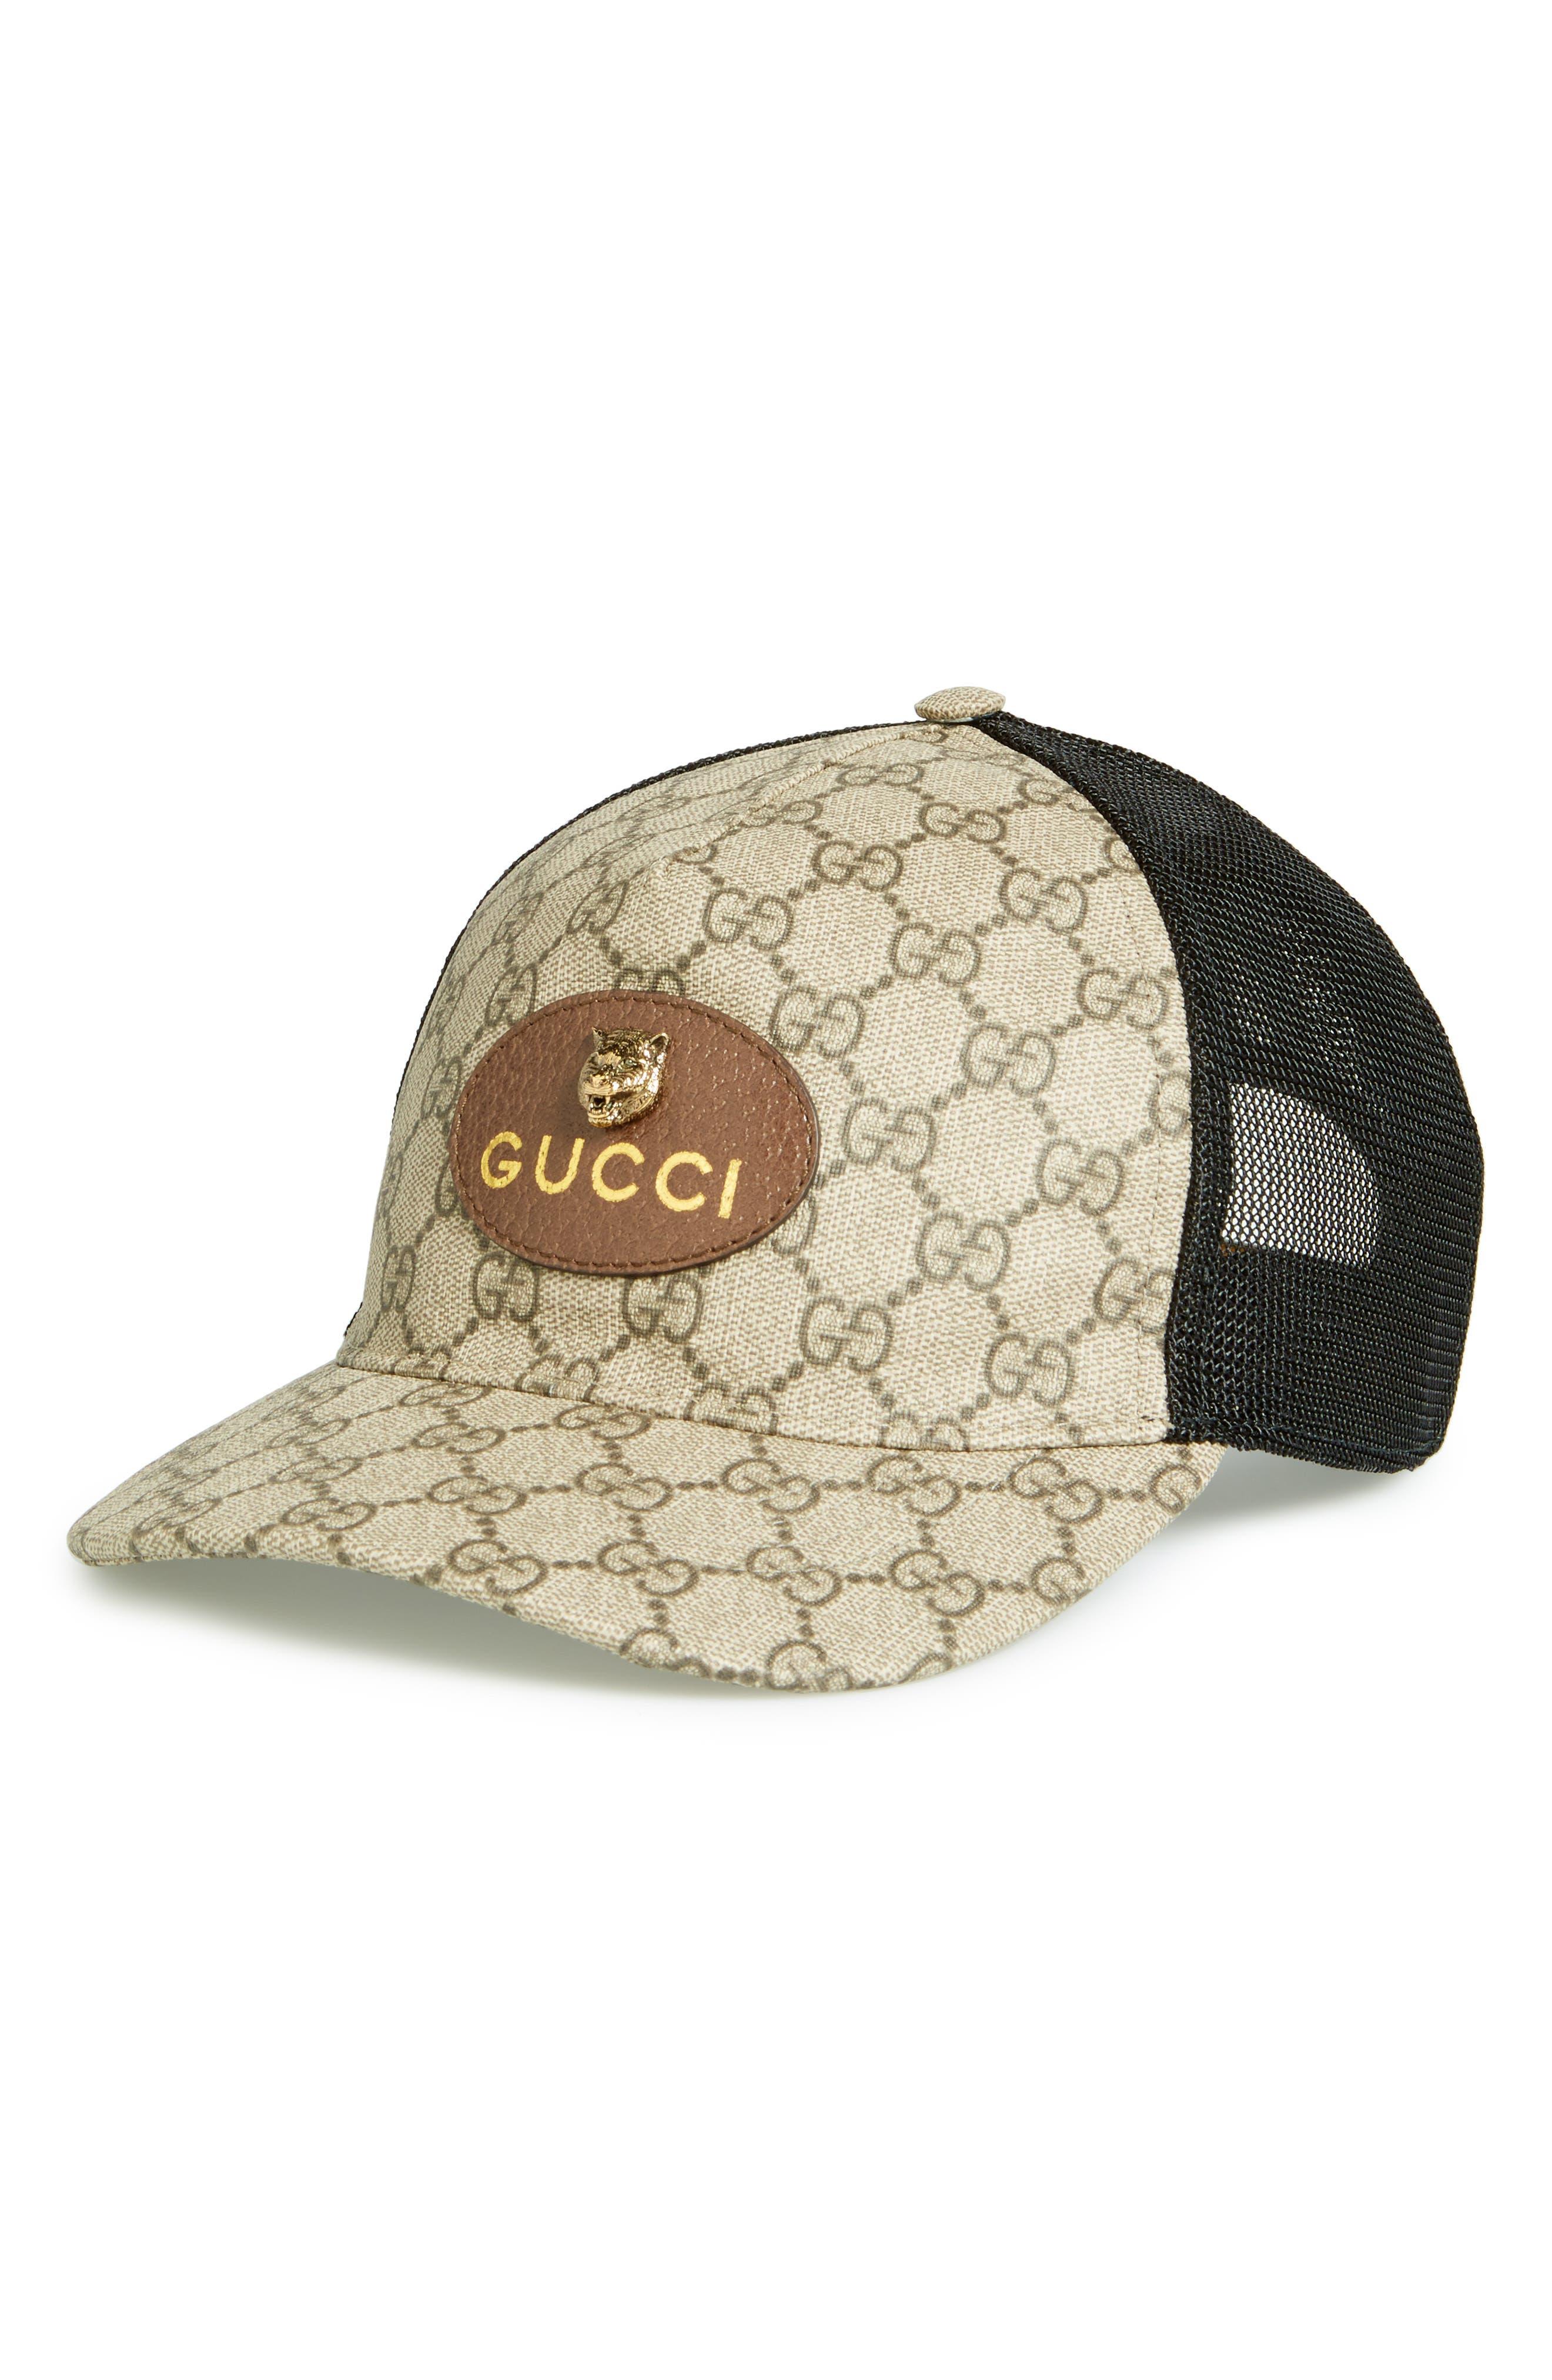 GG Supreme Patch Trucker Hat,                         Main,                         color, Dark Brown